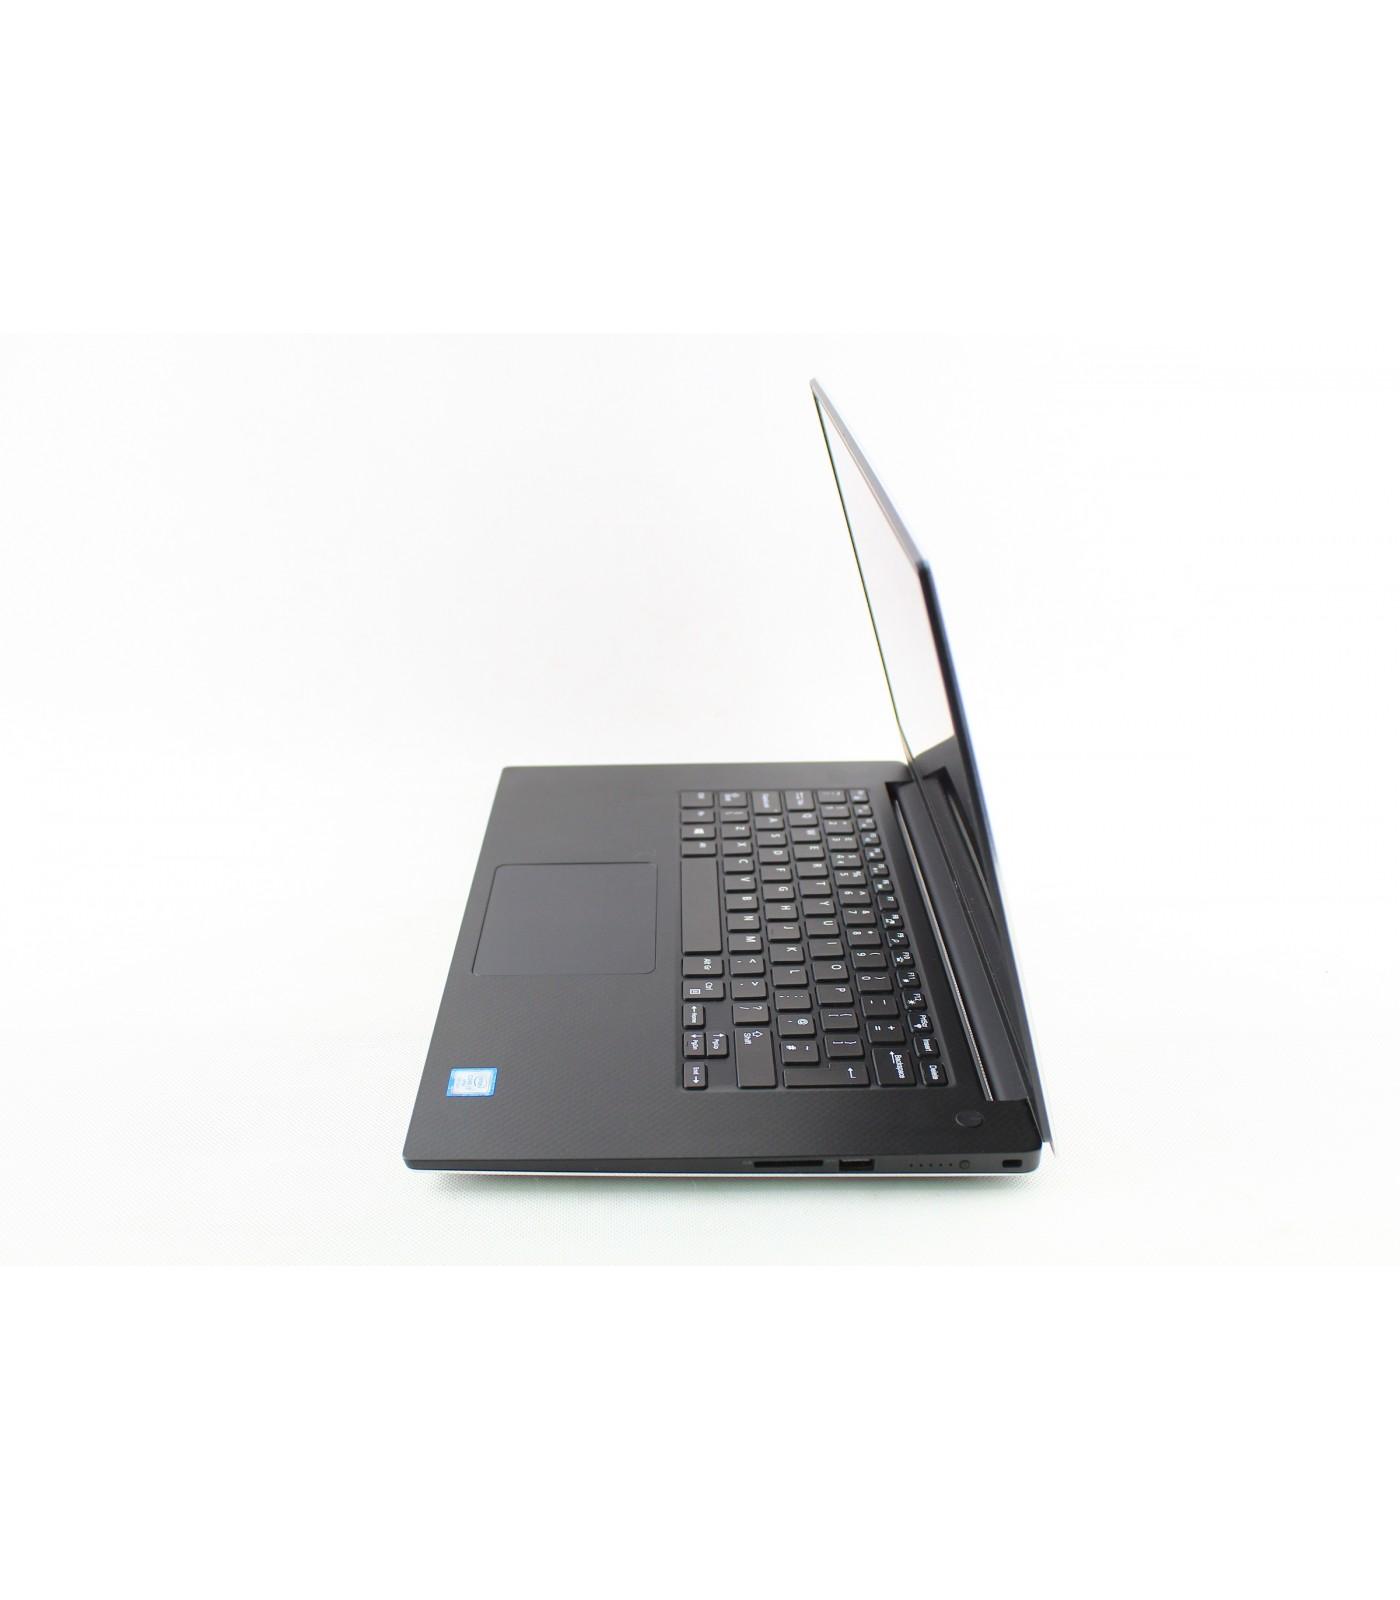 Poleasingowy laptop Dell Precision 5510 z Intel Xeon E3-1505M v5 w Klasie A-.